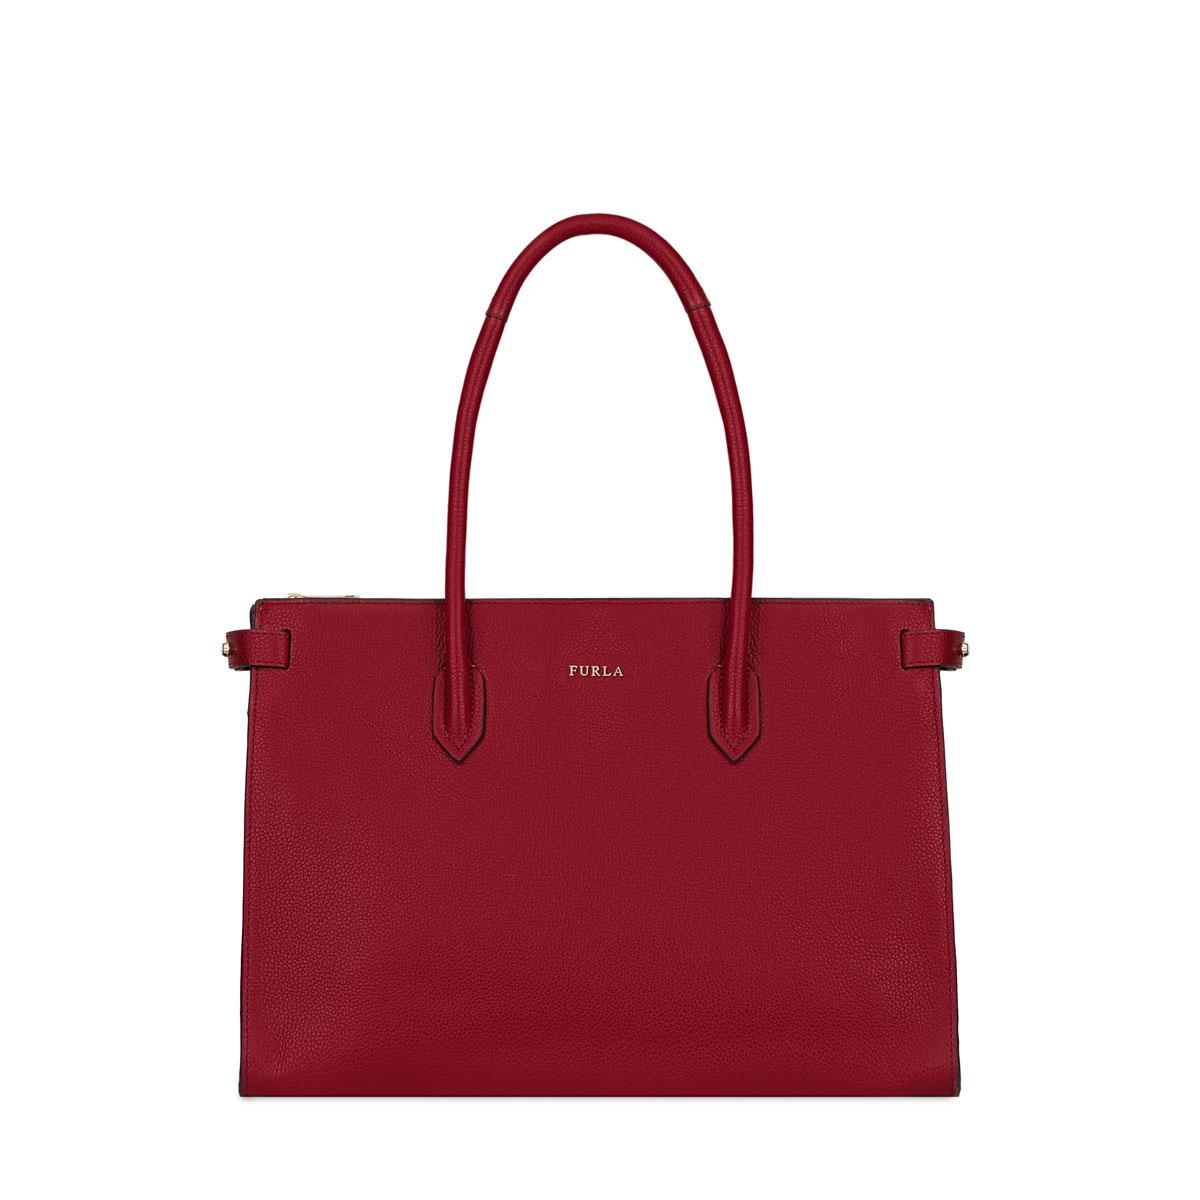 Furla Pin tote shoulder bag M calf leather Cherry.